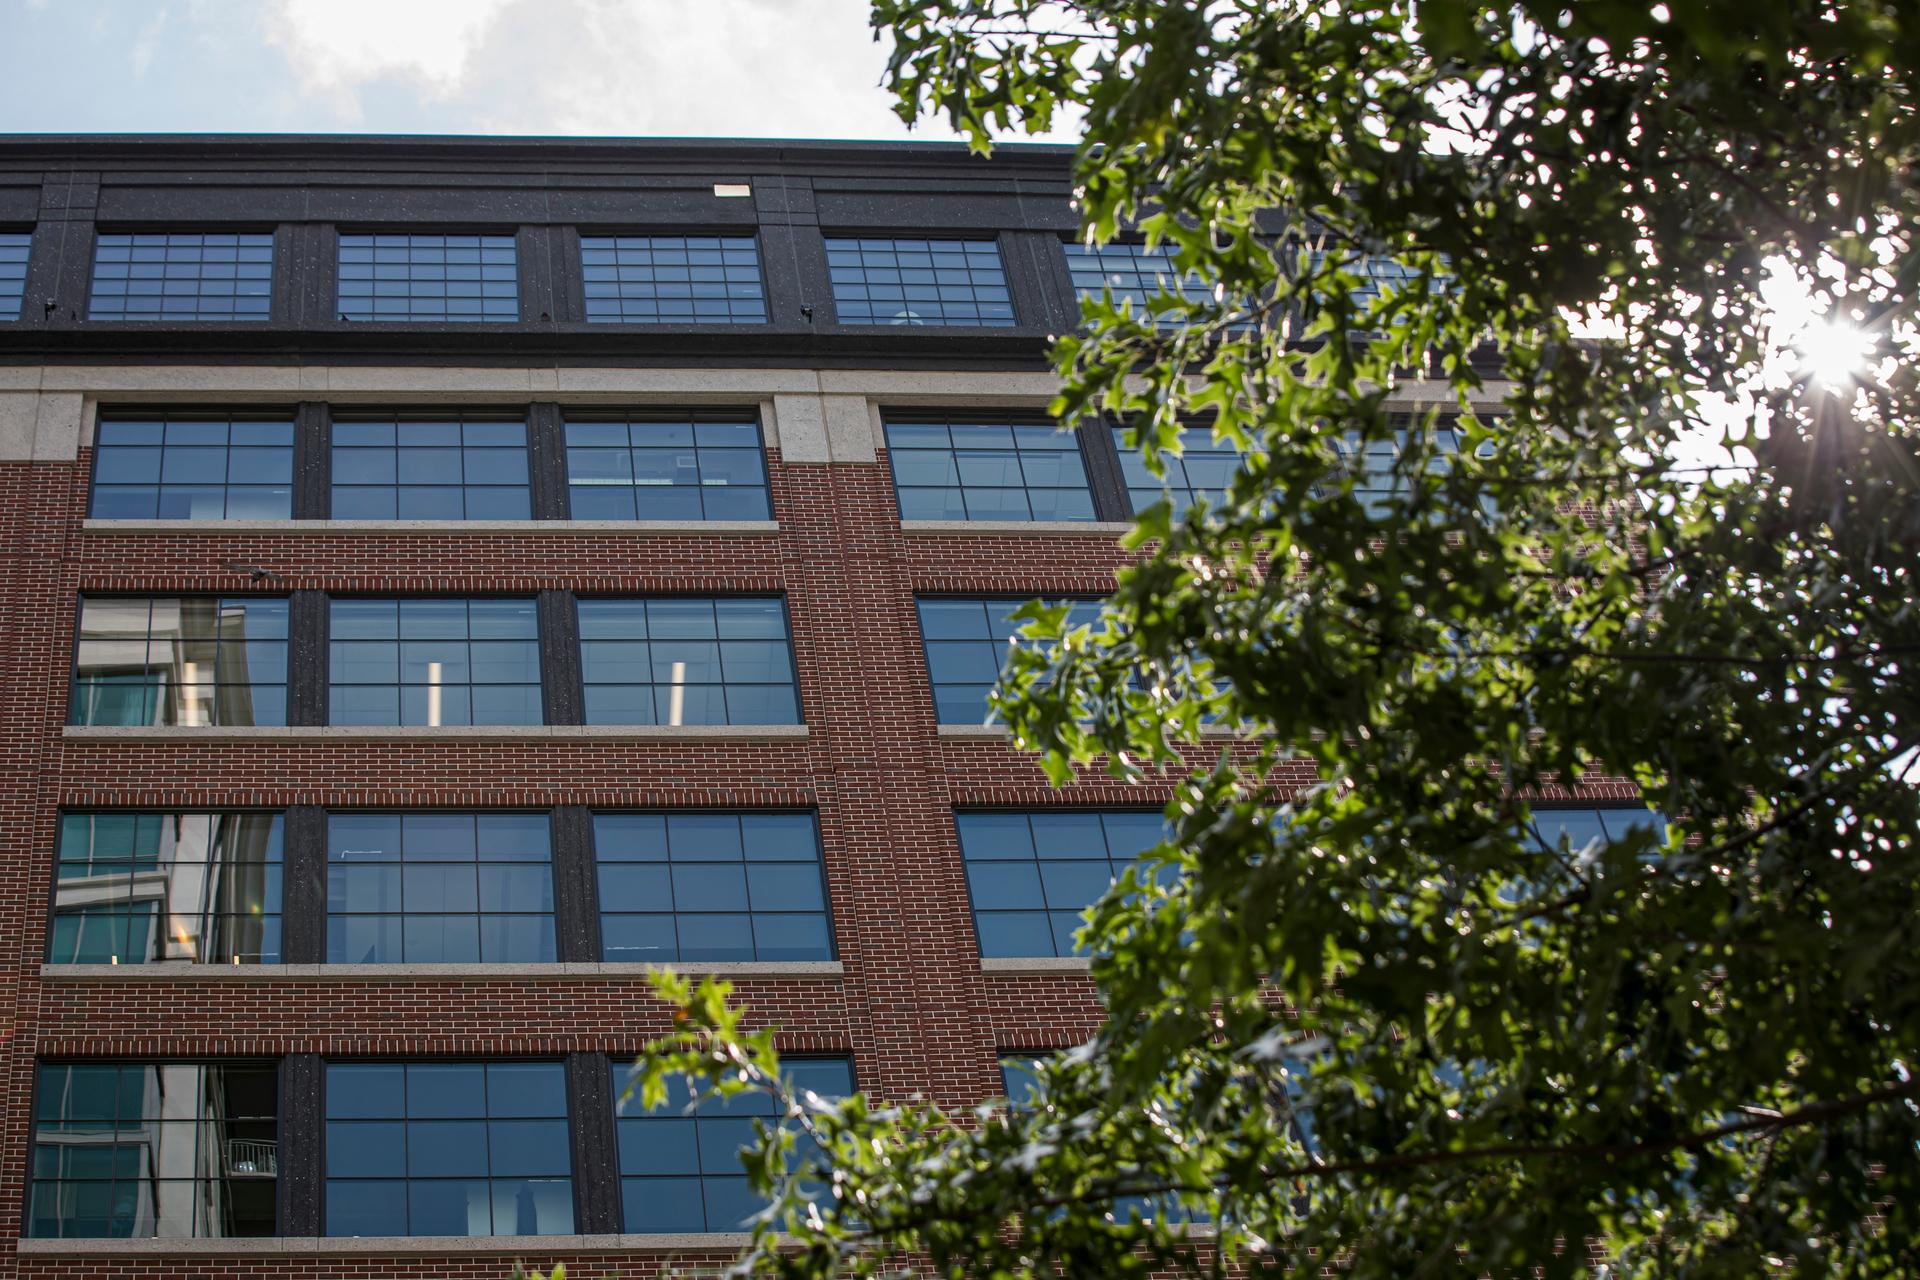 Pella Windows and Doors 309 East Paces Atlanta Georgia Housing Fixed Frame Window Design